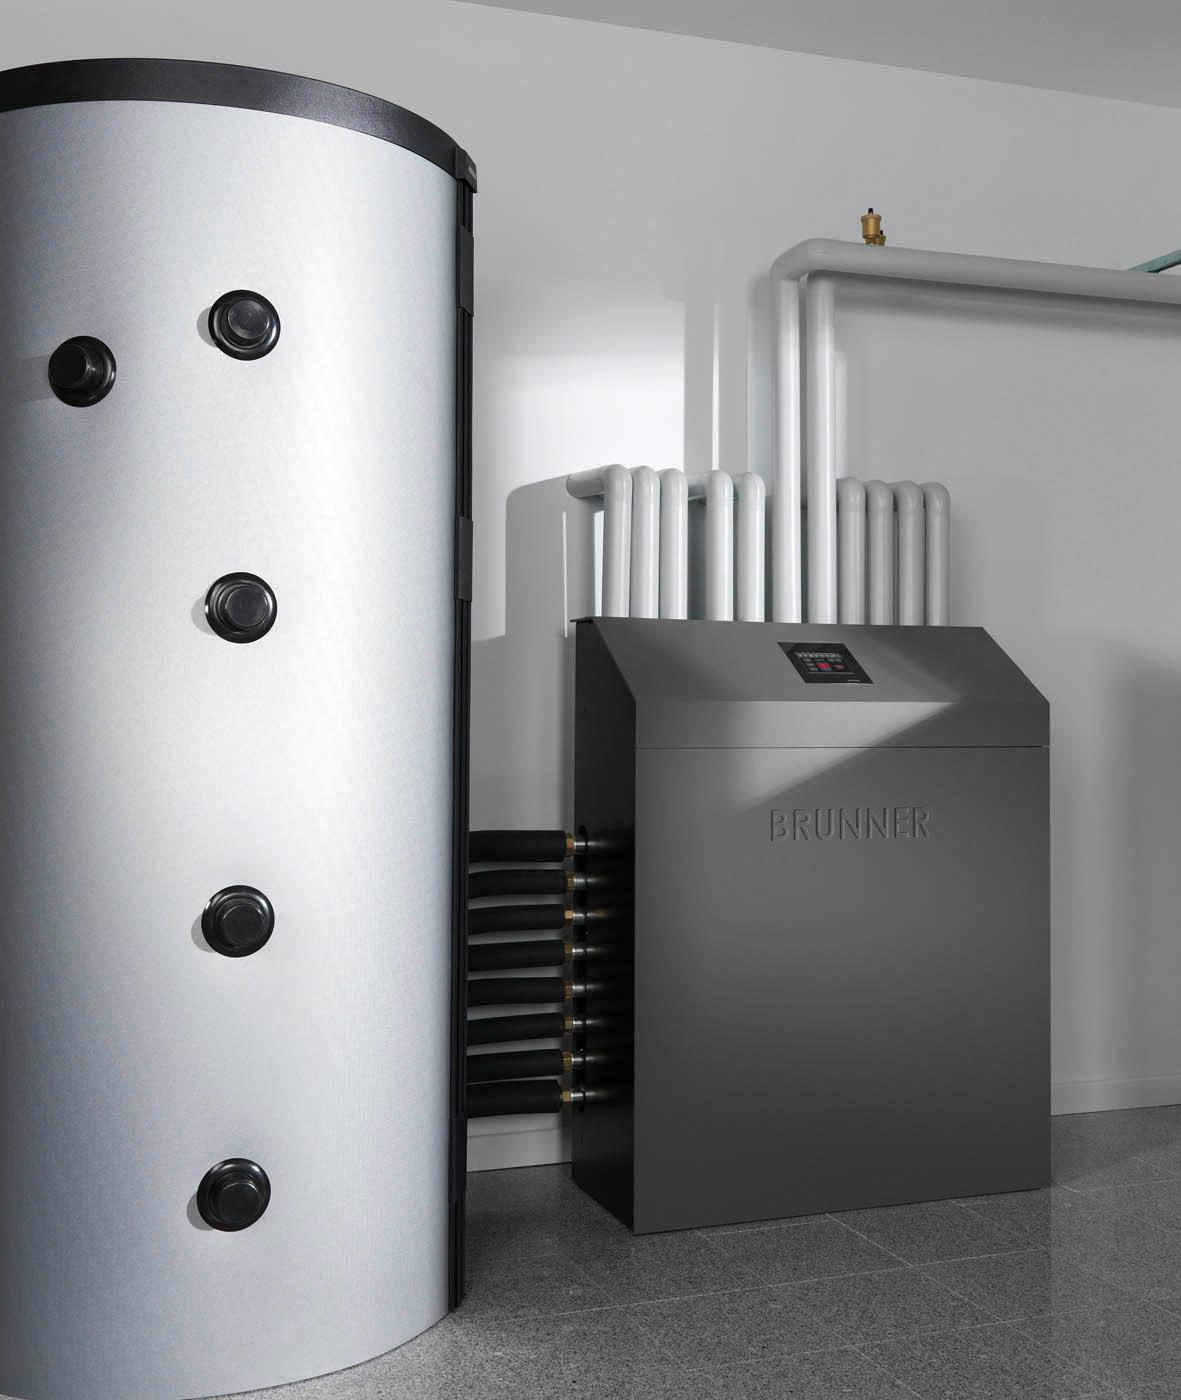 Warmwasseraufbereitung/Kesseltechnik - Brunner, Keller